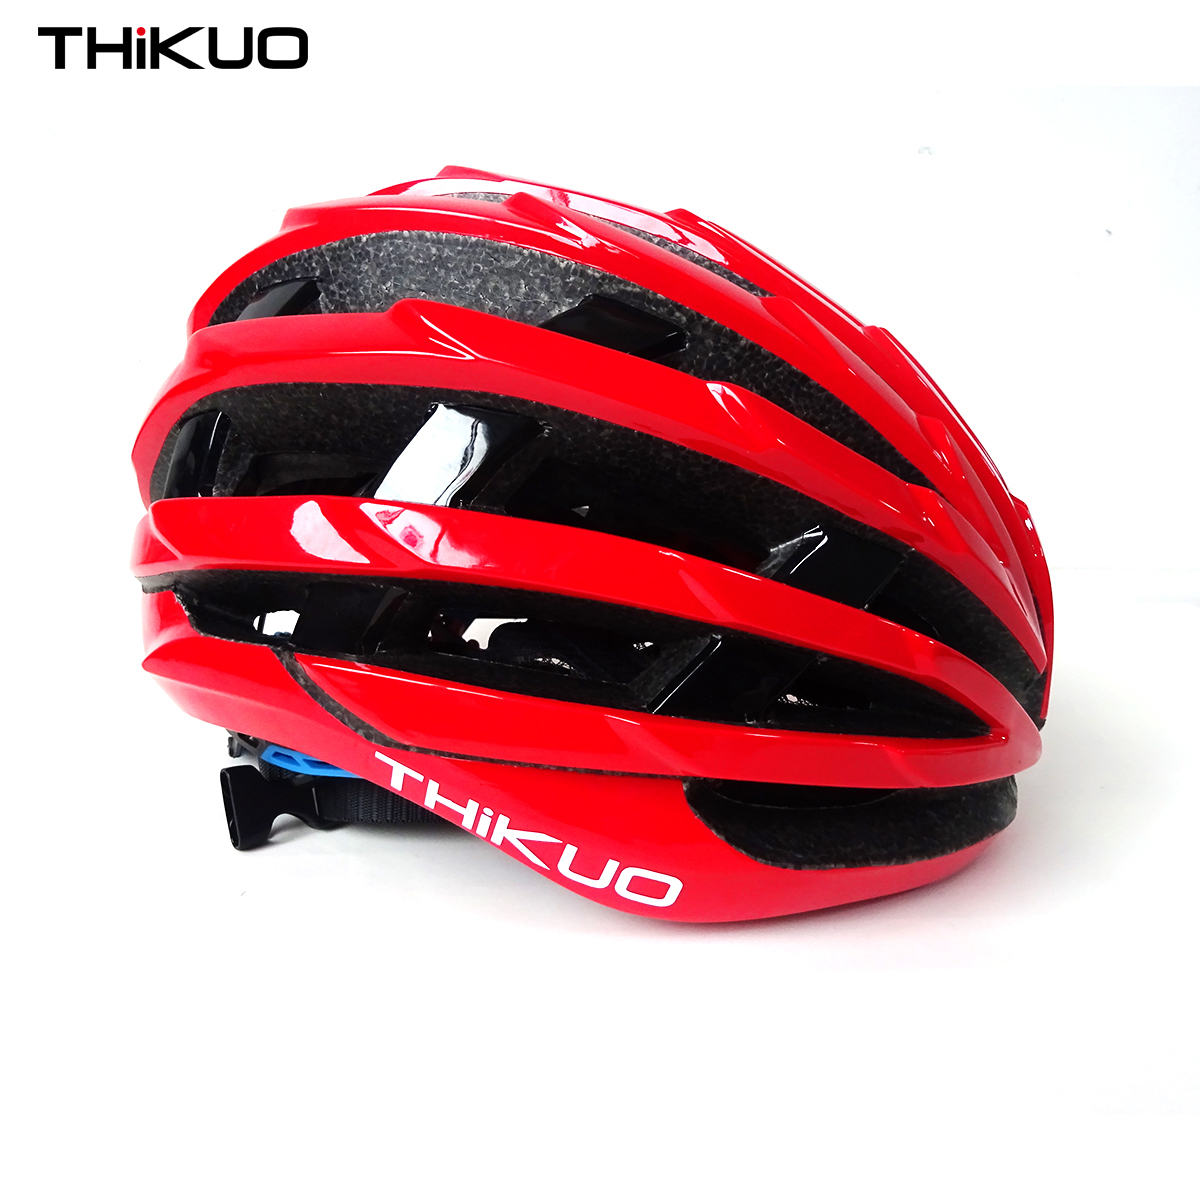 Hedgehog shape bicycle one-piece helmet light weight road bike wemen cycling helmets TH-760 1